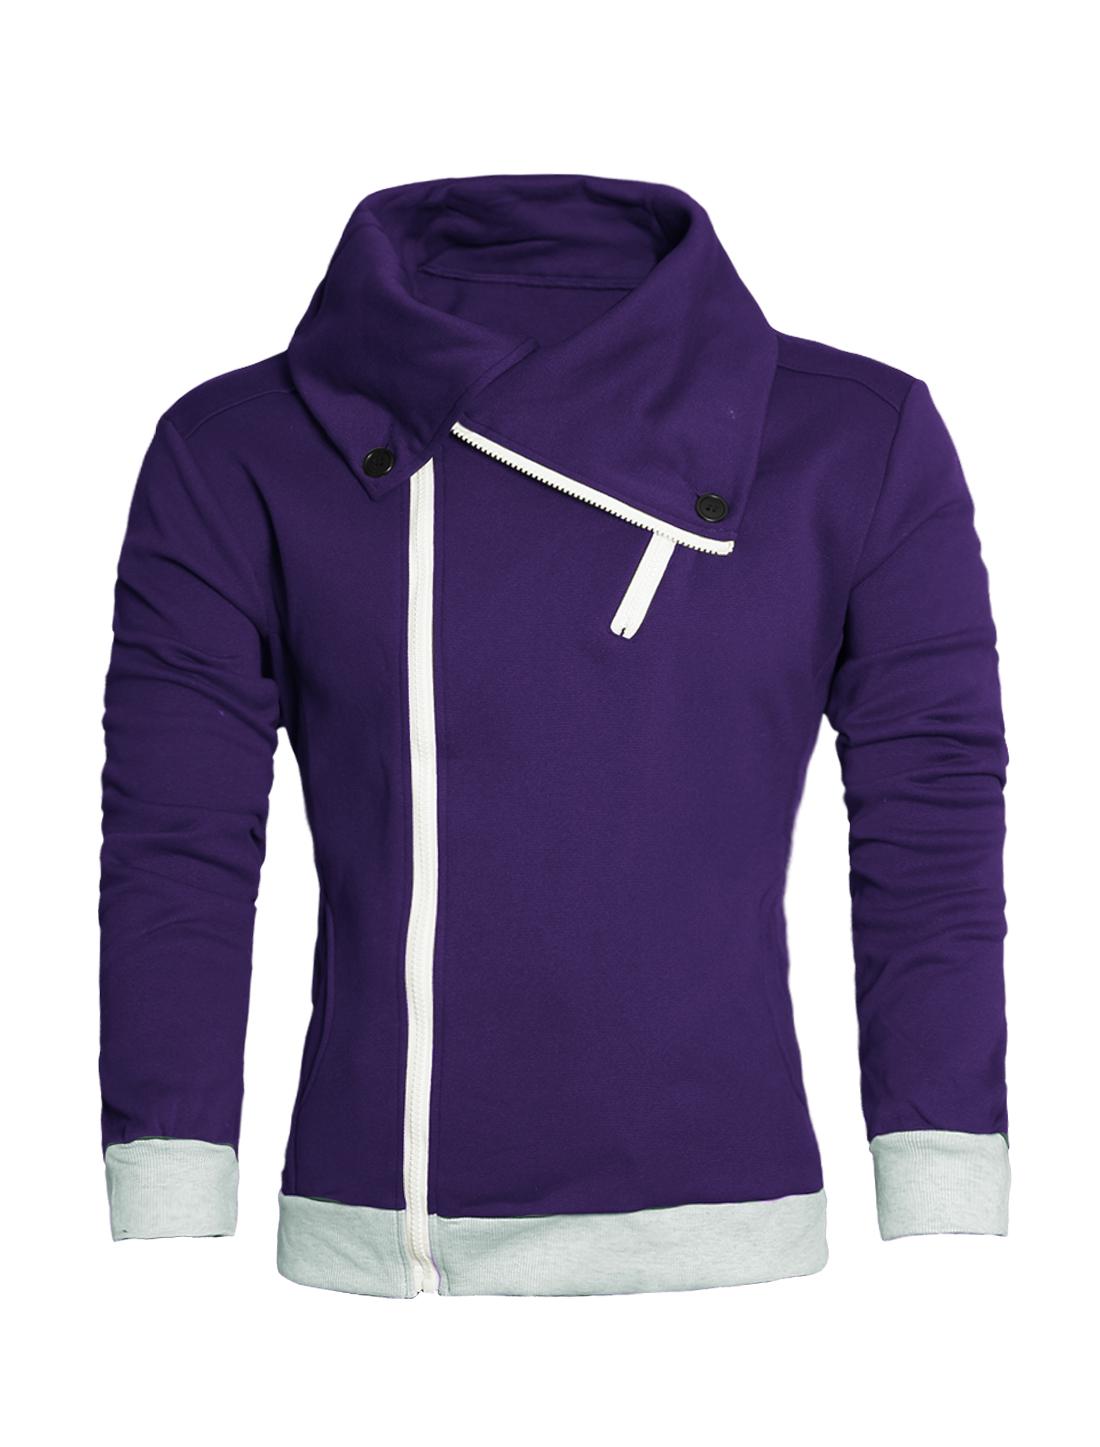 Double Pocket Turn Down Collar Purple Sweatshirt for Men M